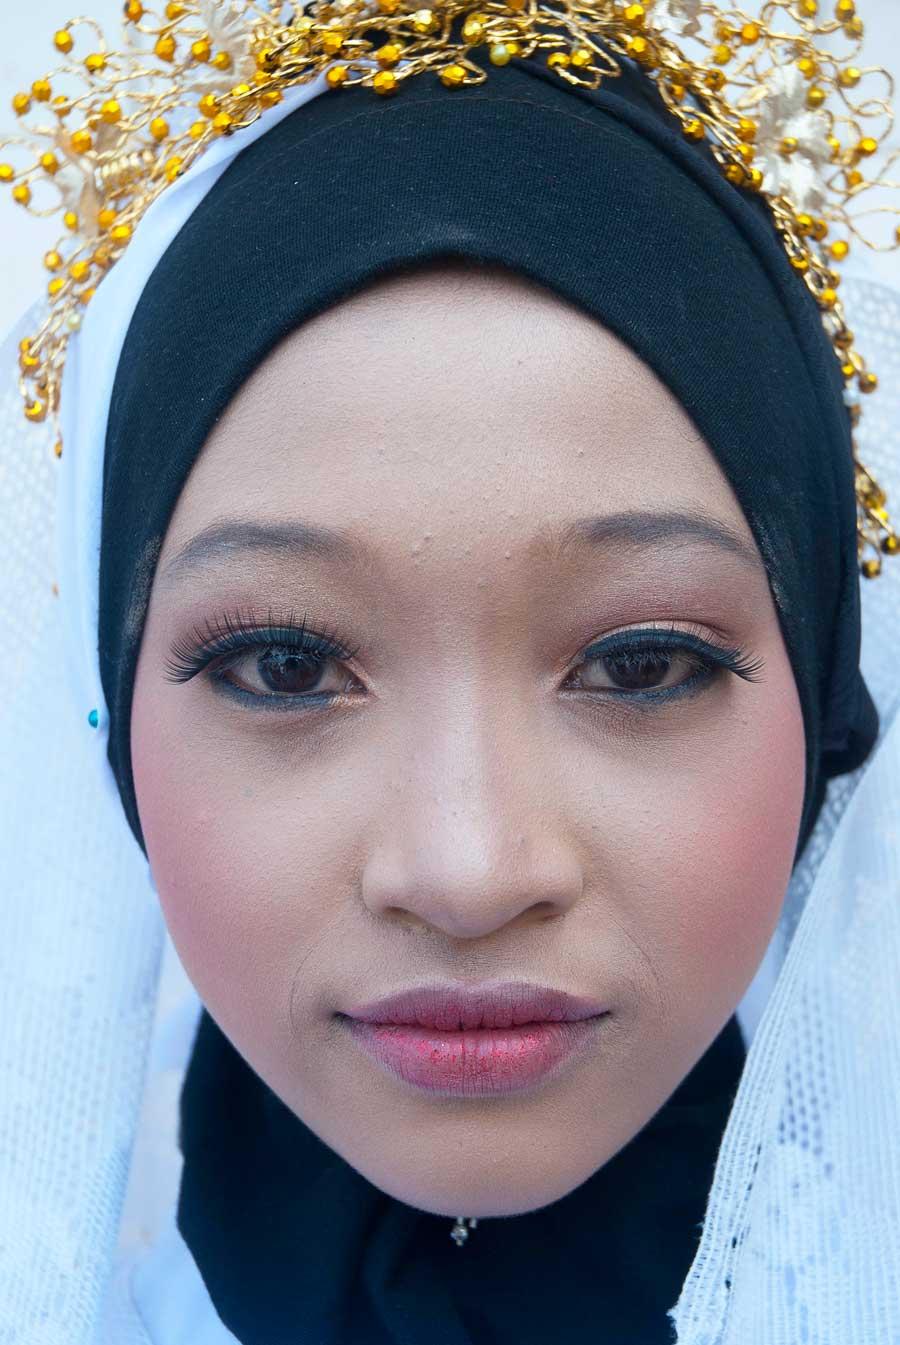 Viatges-Tuareg-Indonesia-Anna-Boye